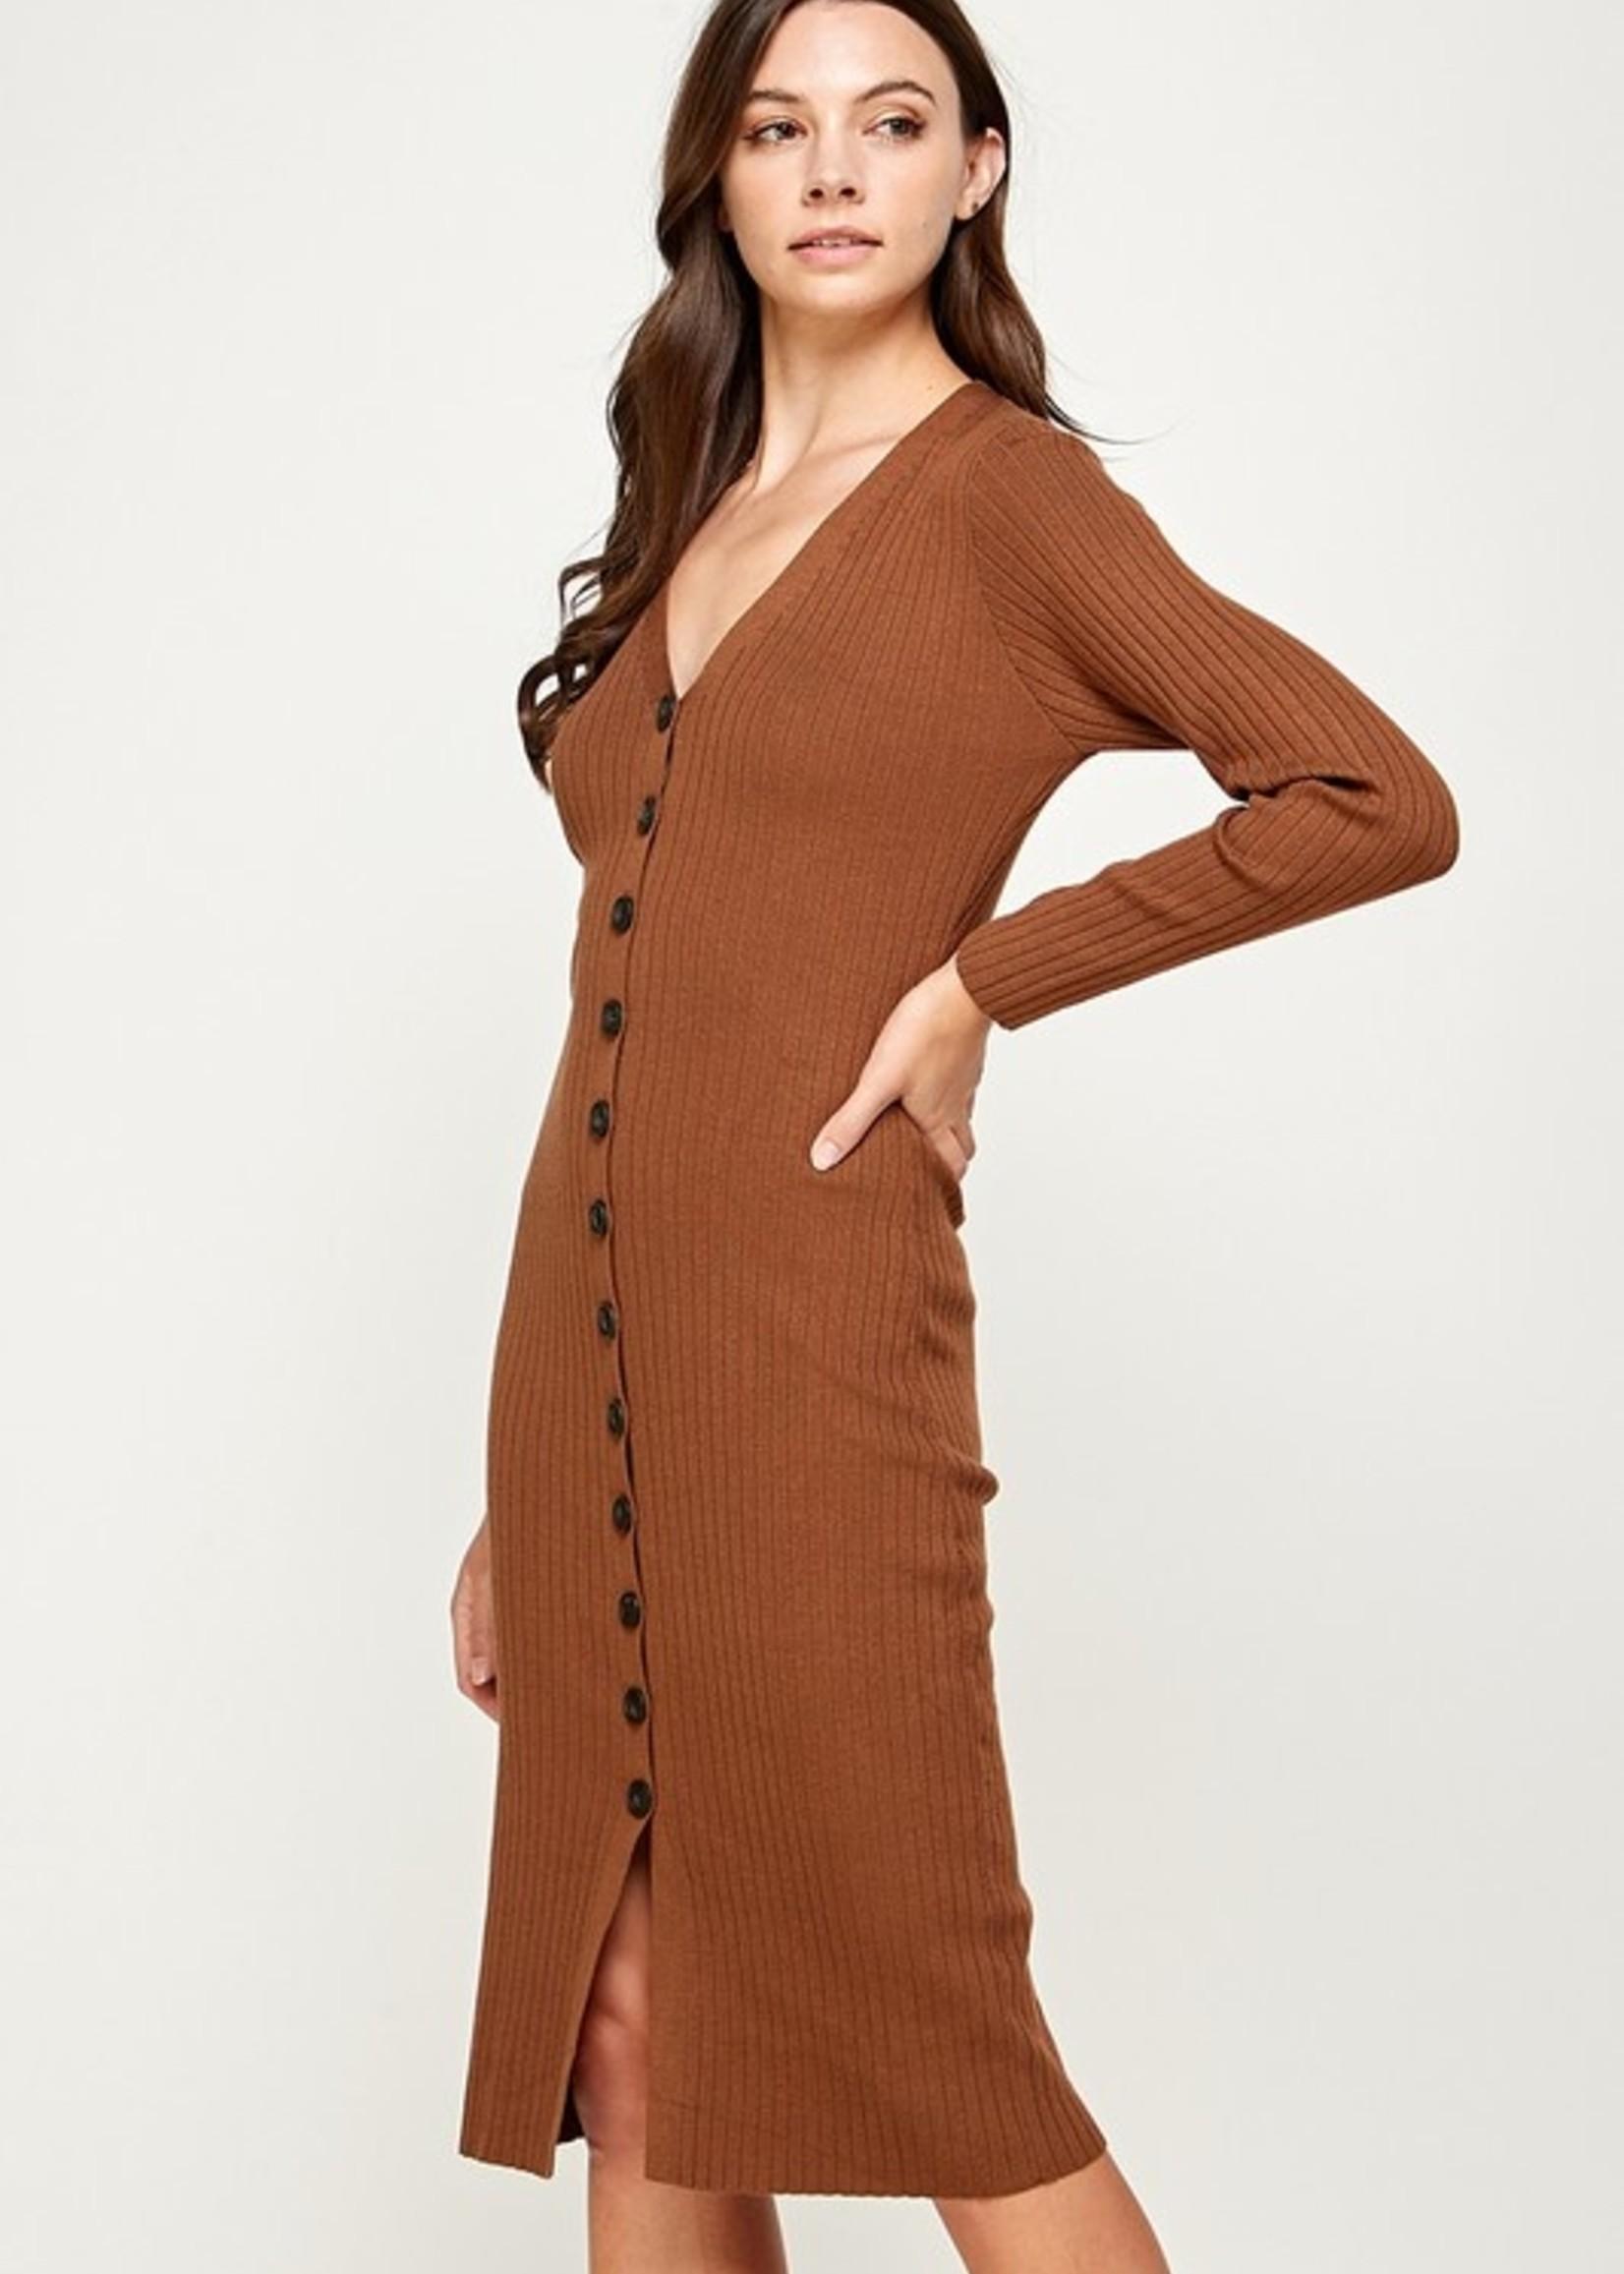 Long Sleeve Button Down Sweater Dress - Brown